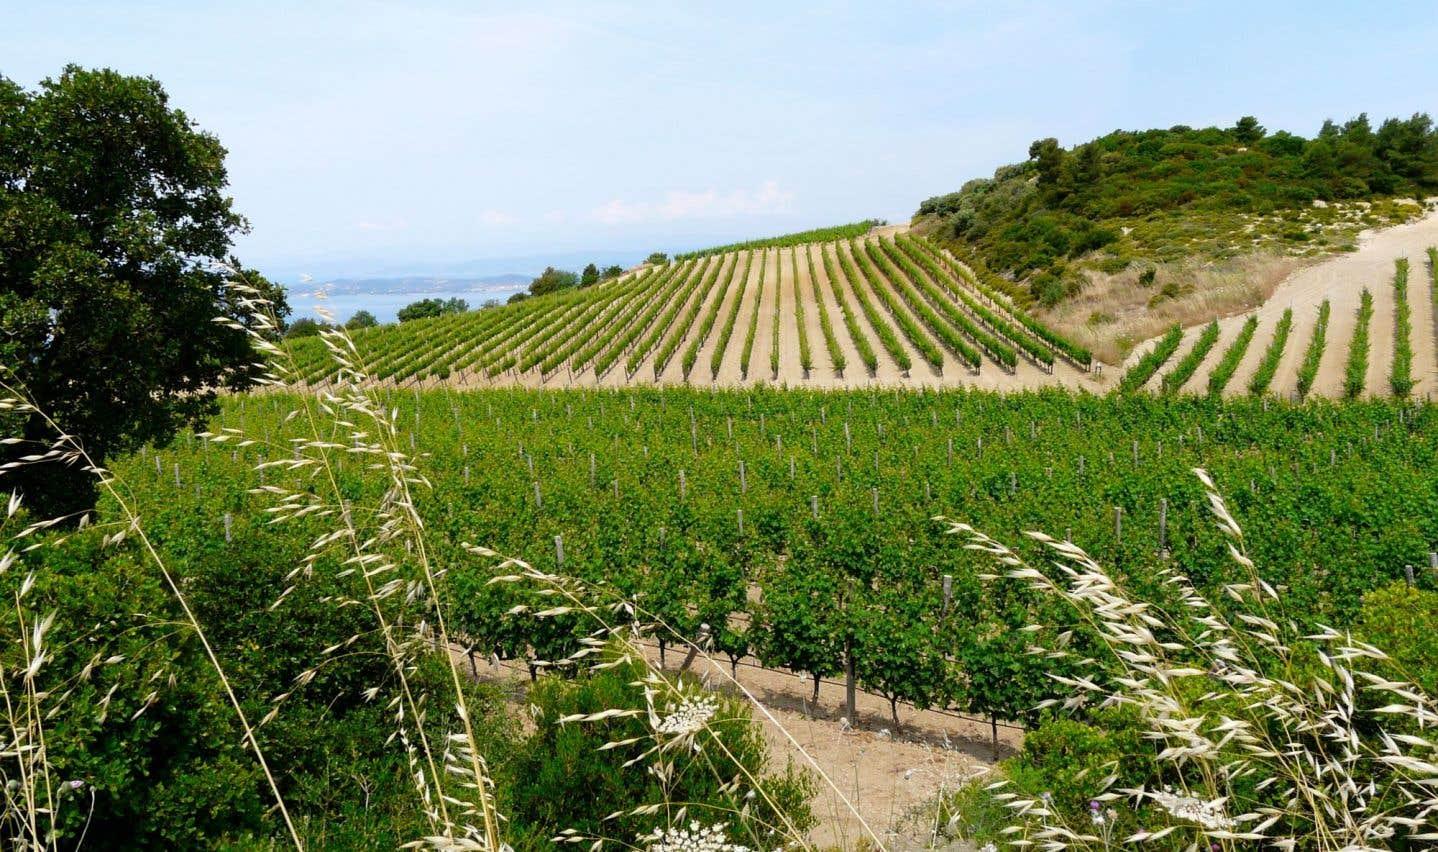 Vignoble grec en agriculture biologique